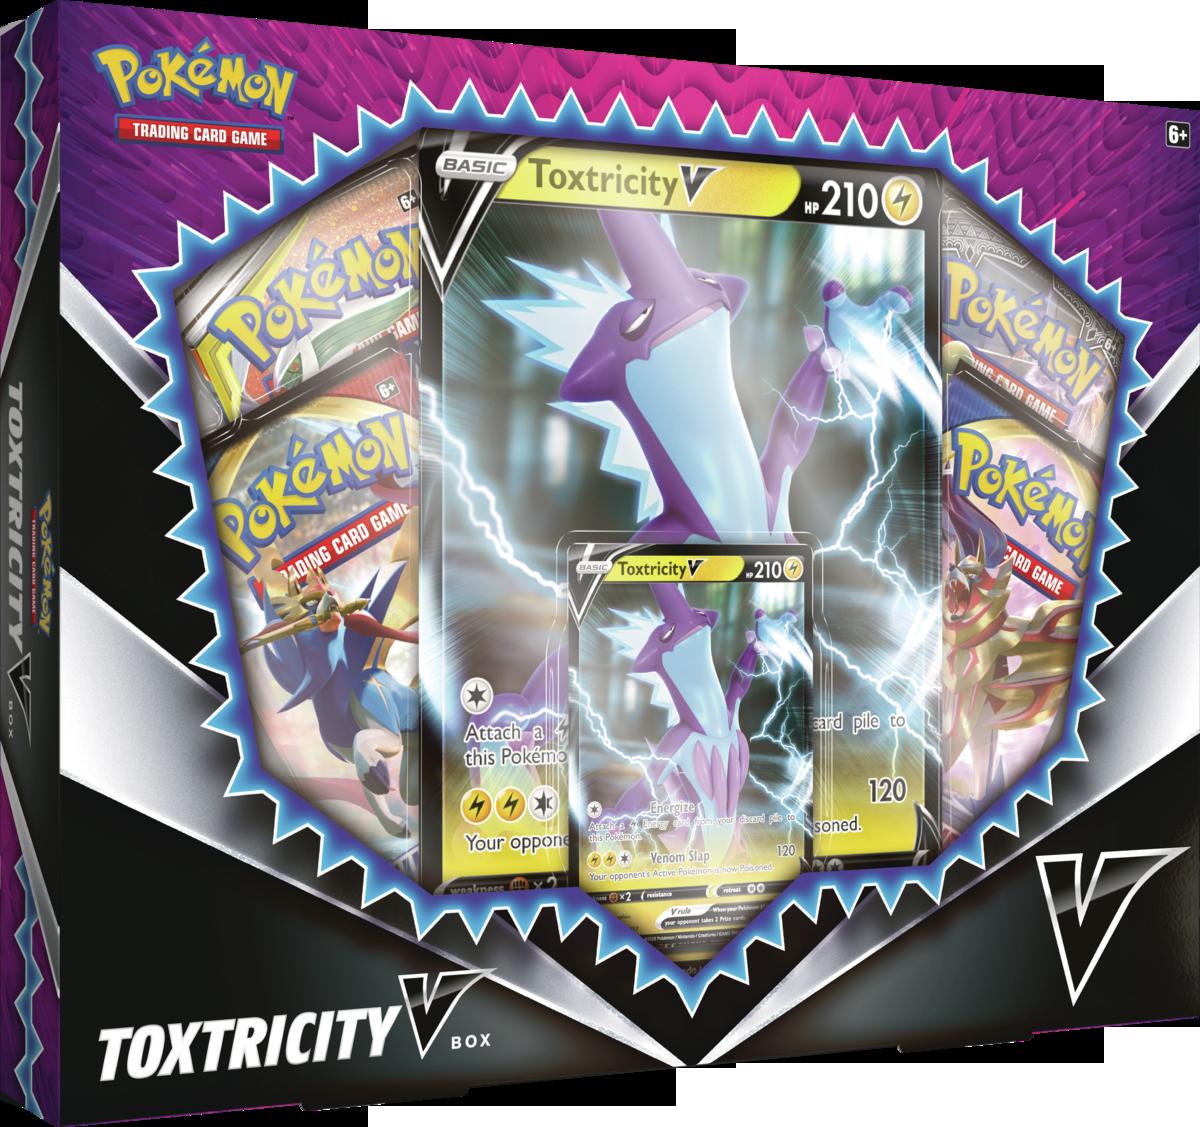 Pokemon USA POKEMON: TOXTRICITY V BOX